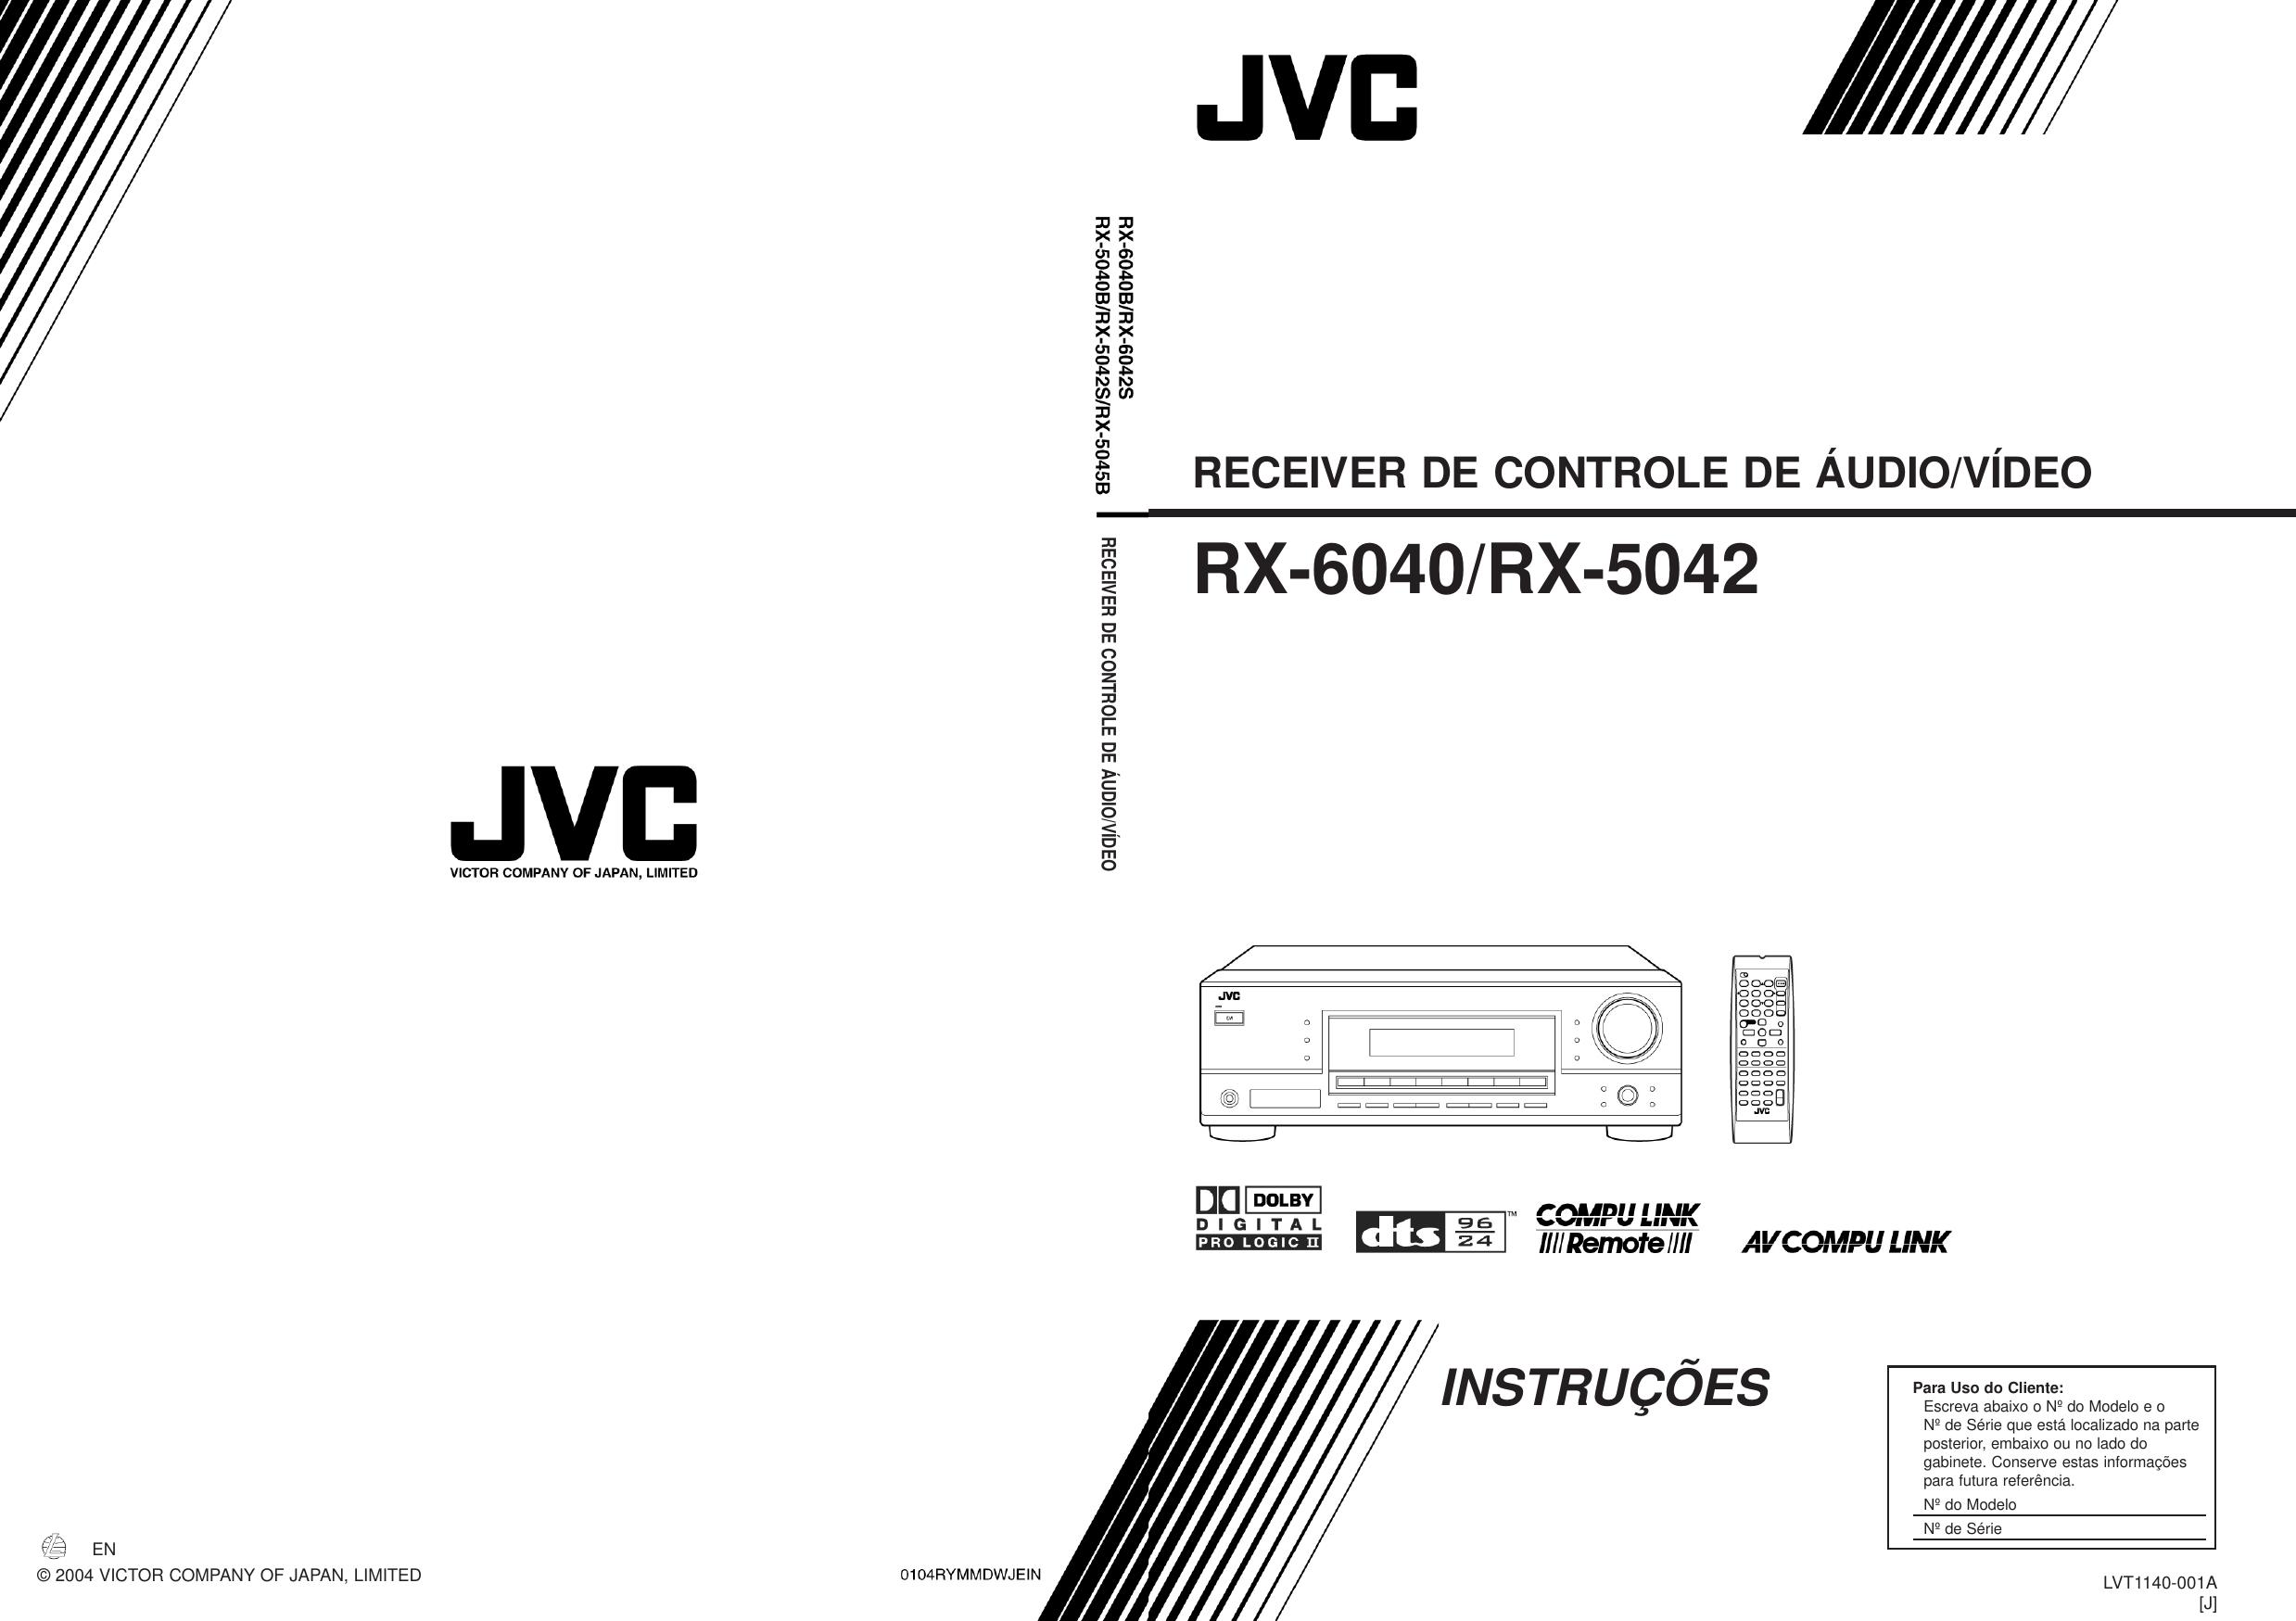 Jvc pro manuals array jvc rx 5042 25246 a rx 6040 rx5042 brochura p65 user manual lvt1140 001a fandeluxe Images